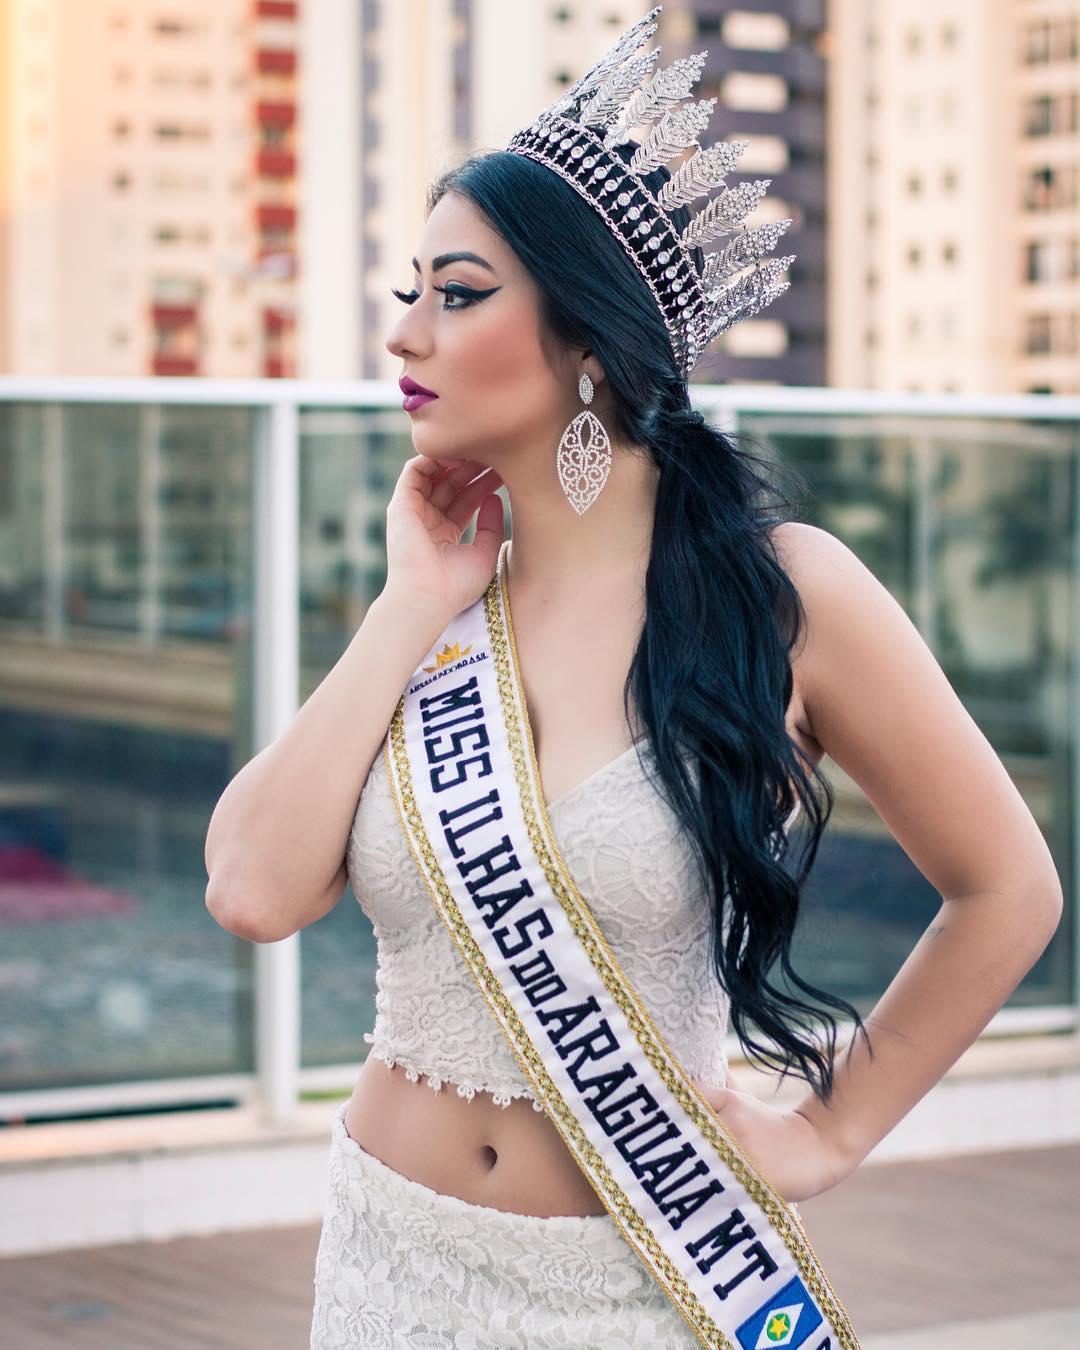 miss araguaia, ilhas (ilhas do araguaia) mundo 2017, quetlin heidrich. 19227210